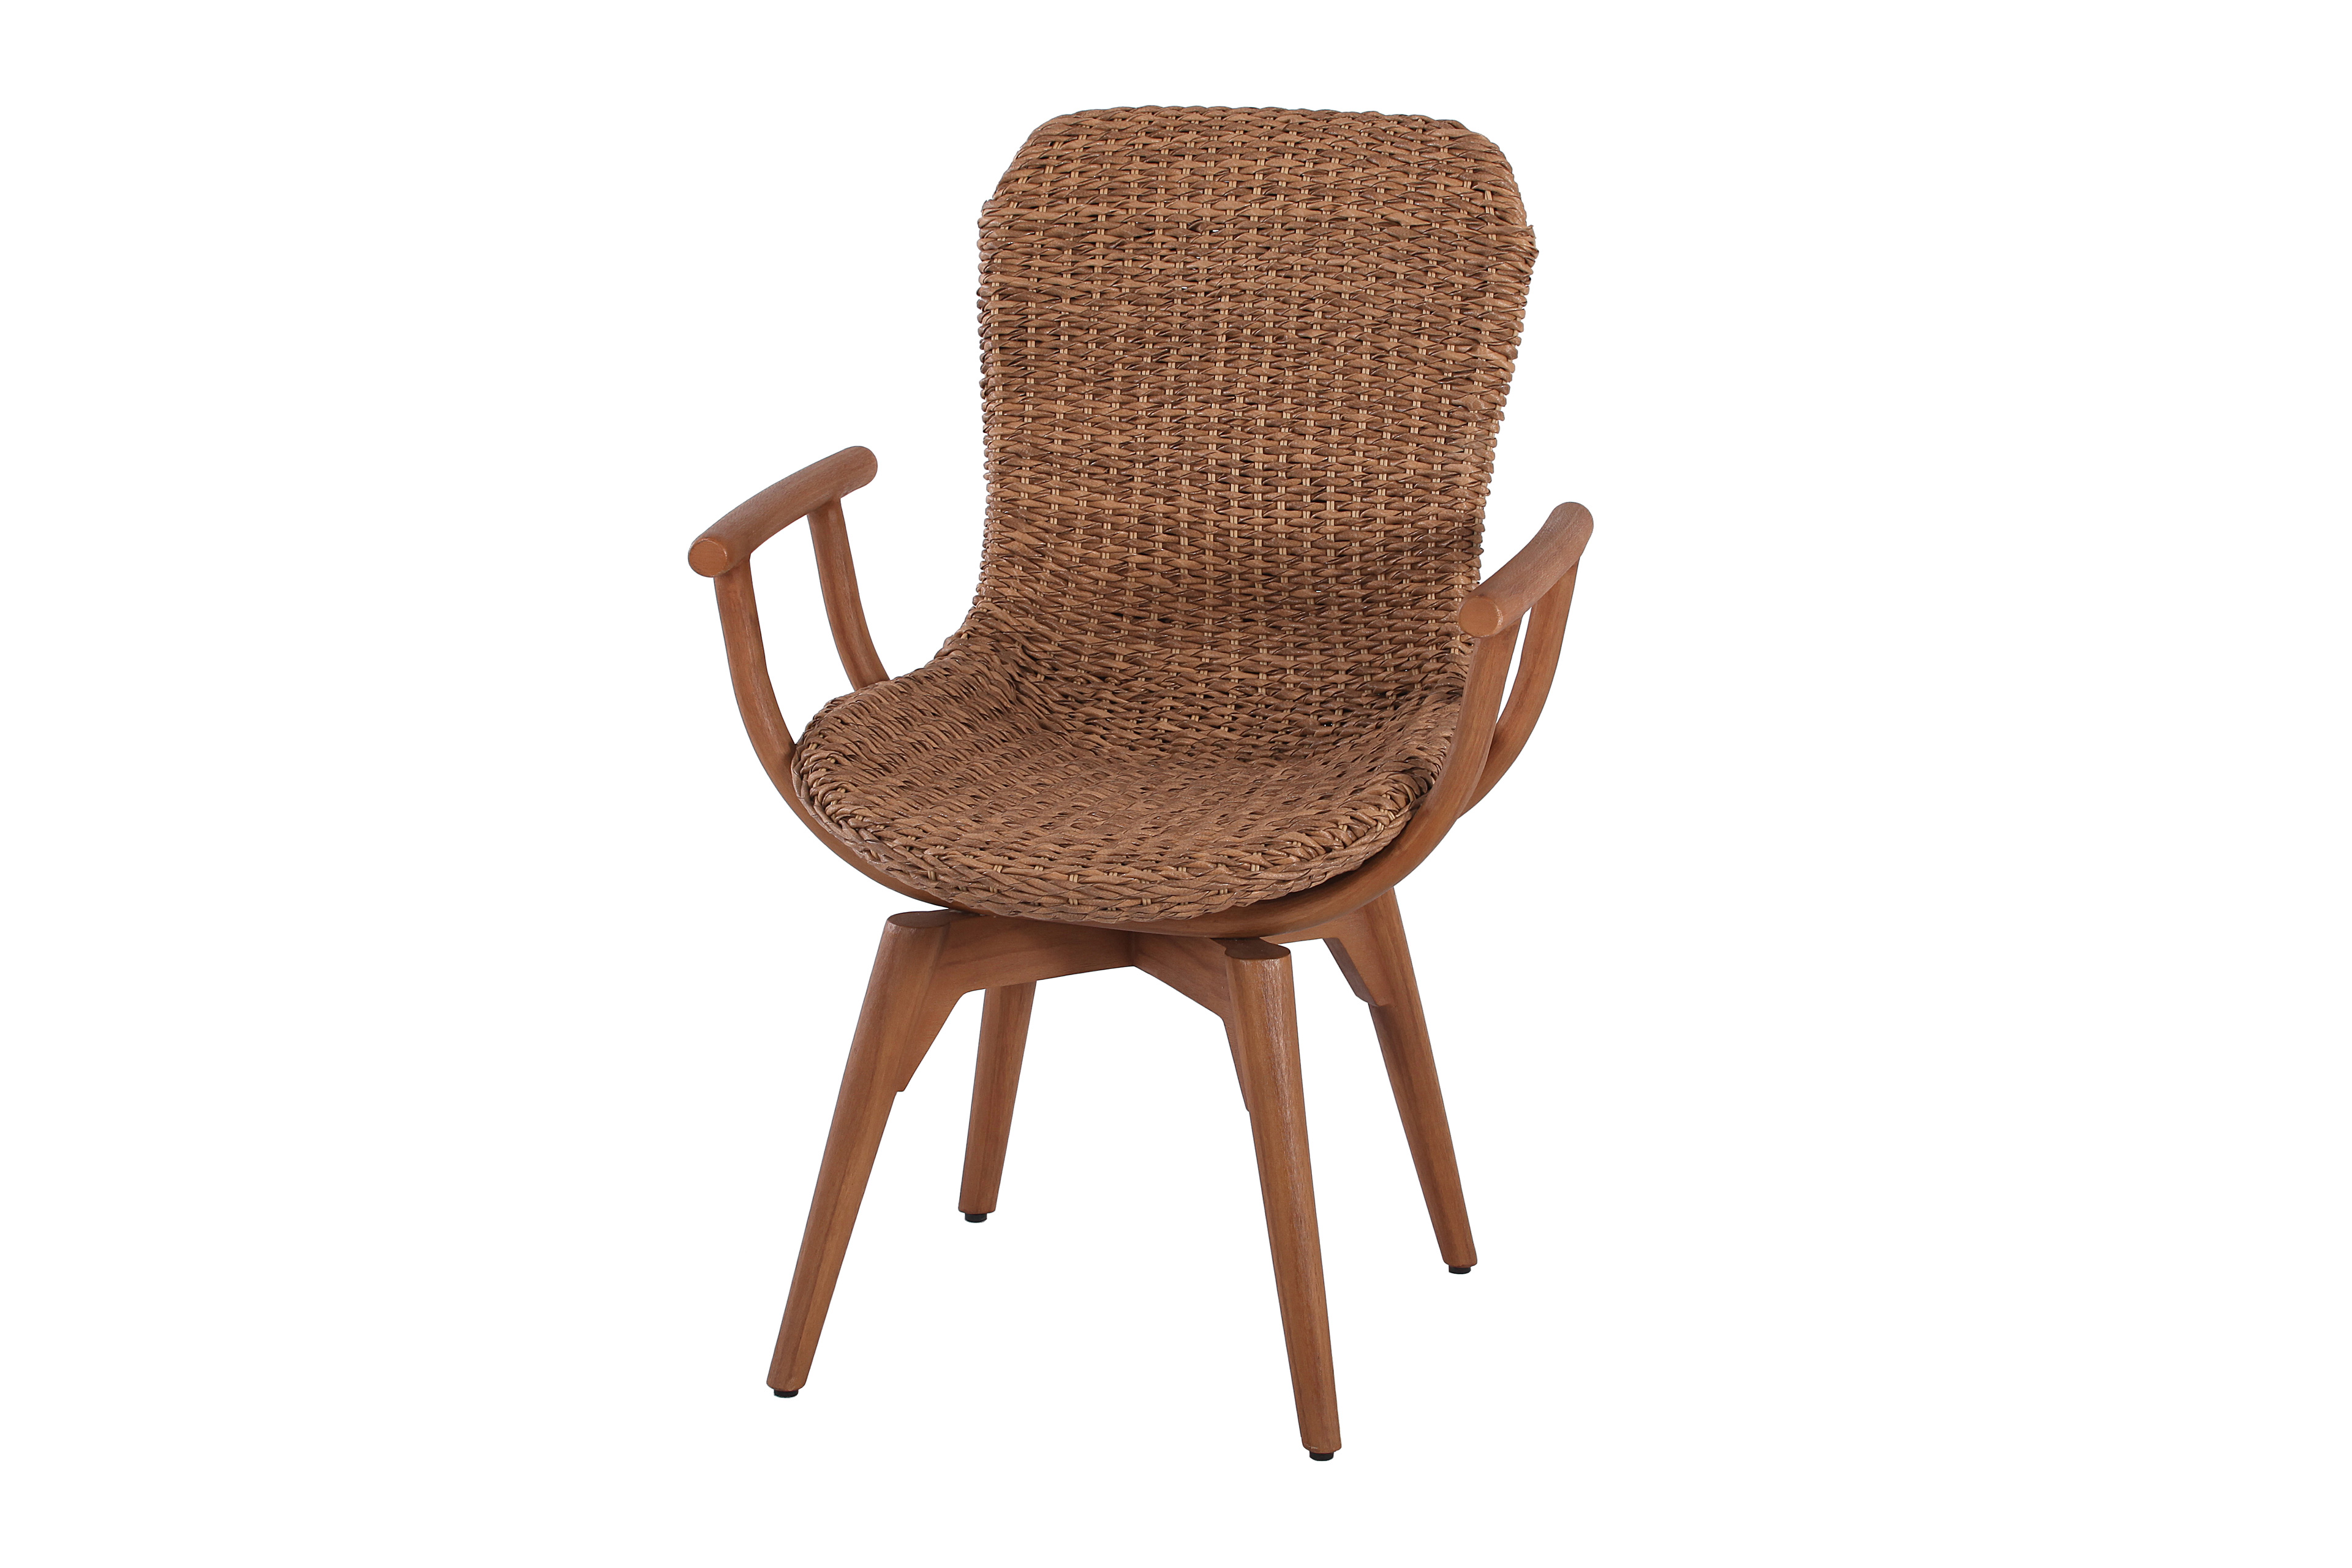 mbm living gartenm bel set orlando aus mirotex geflecht m bel letz ihr online shop. Black Bedroom Furniture Sets. Home Design Ideas